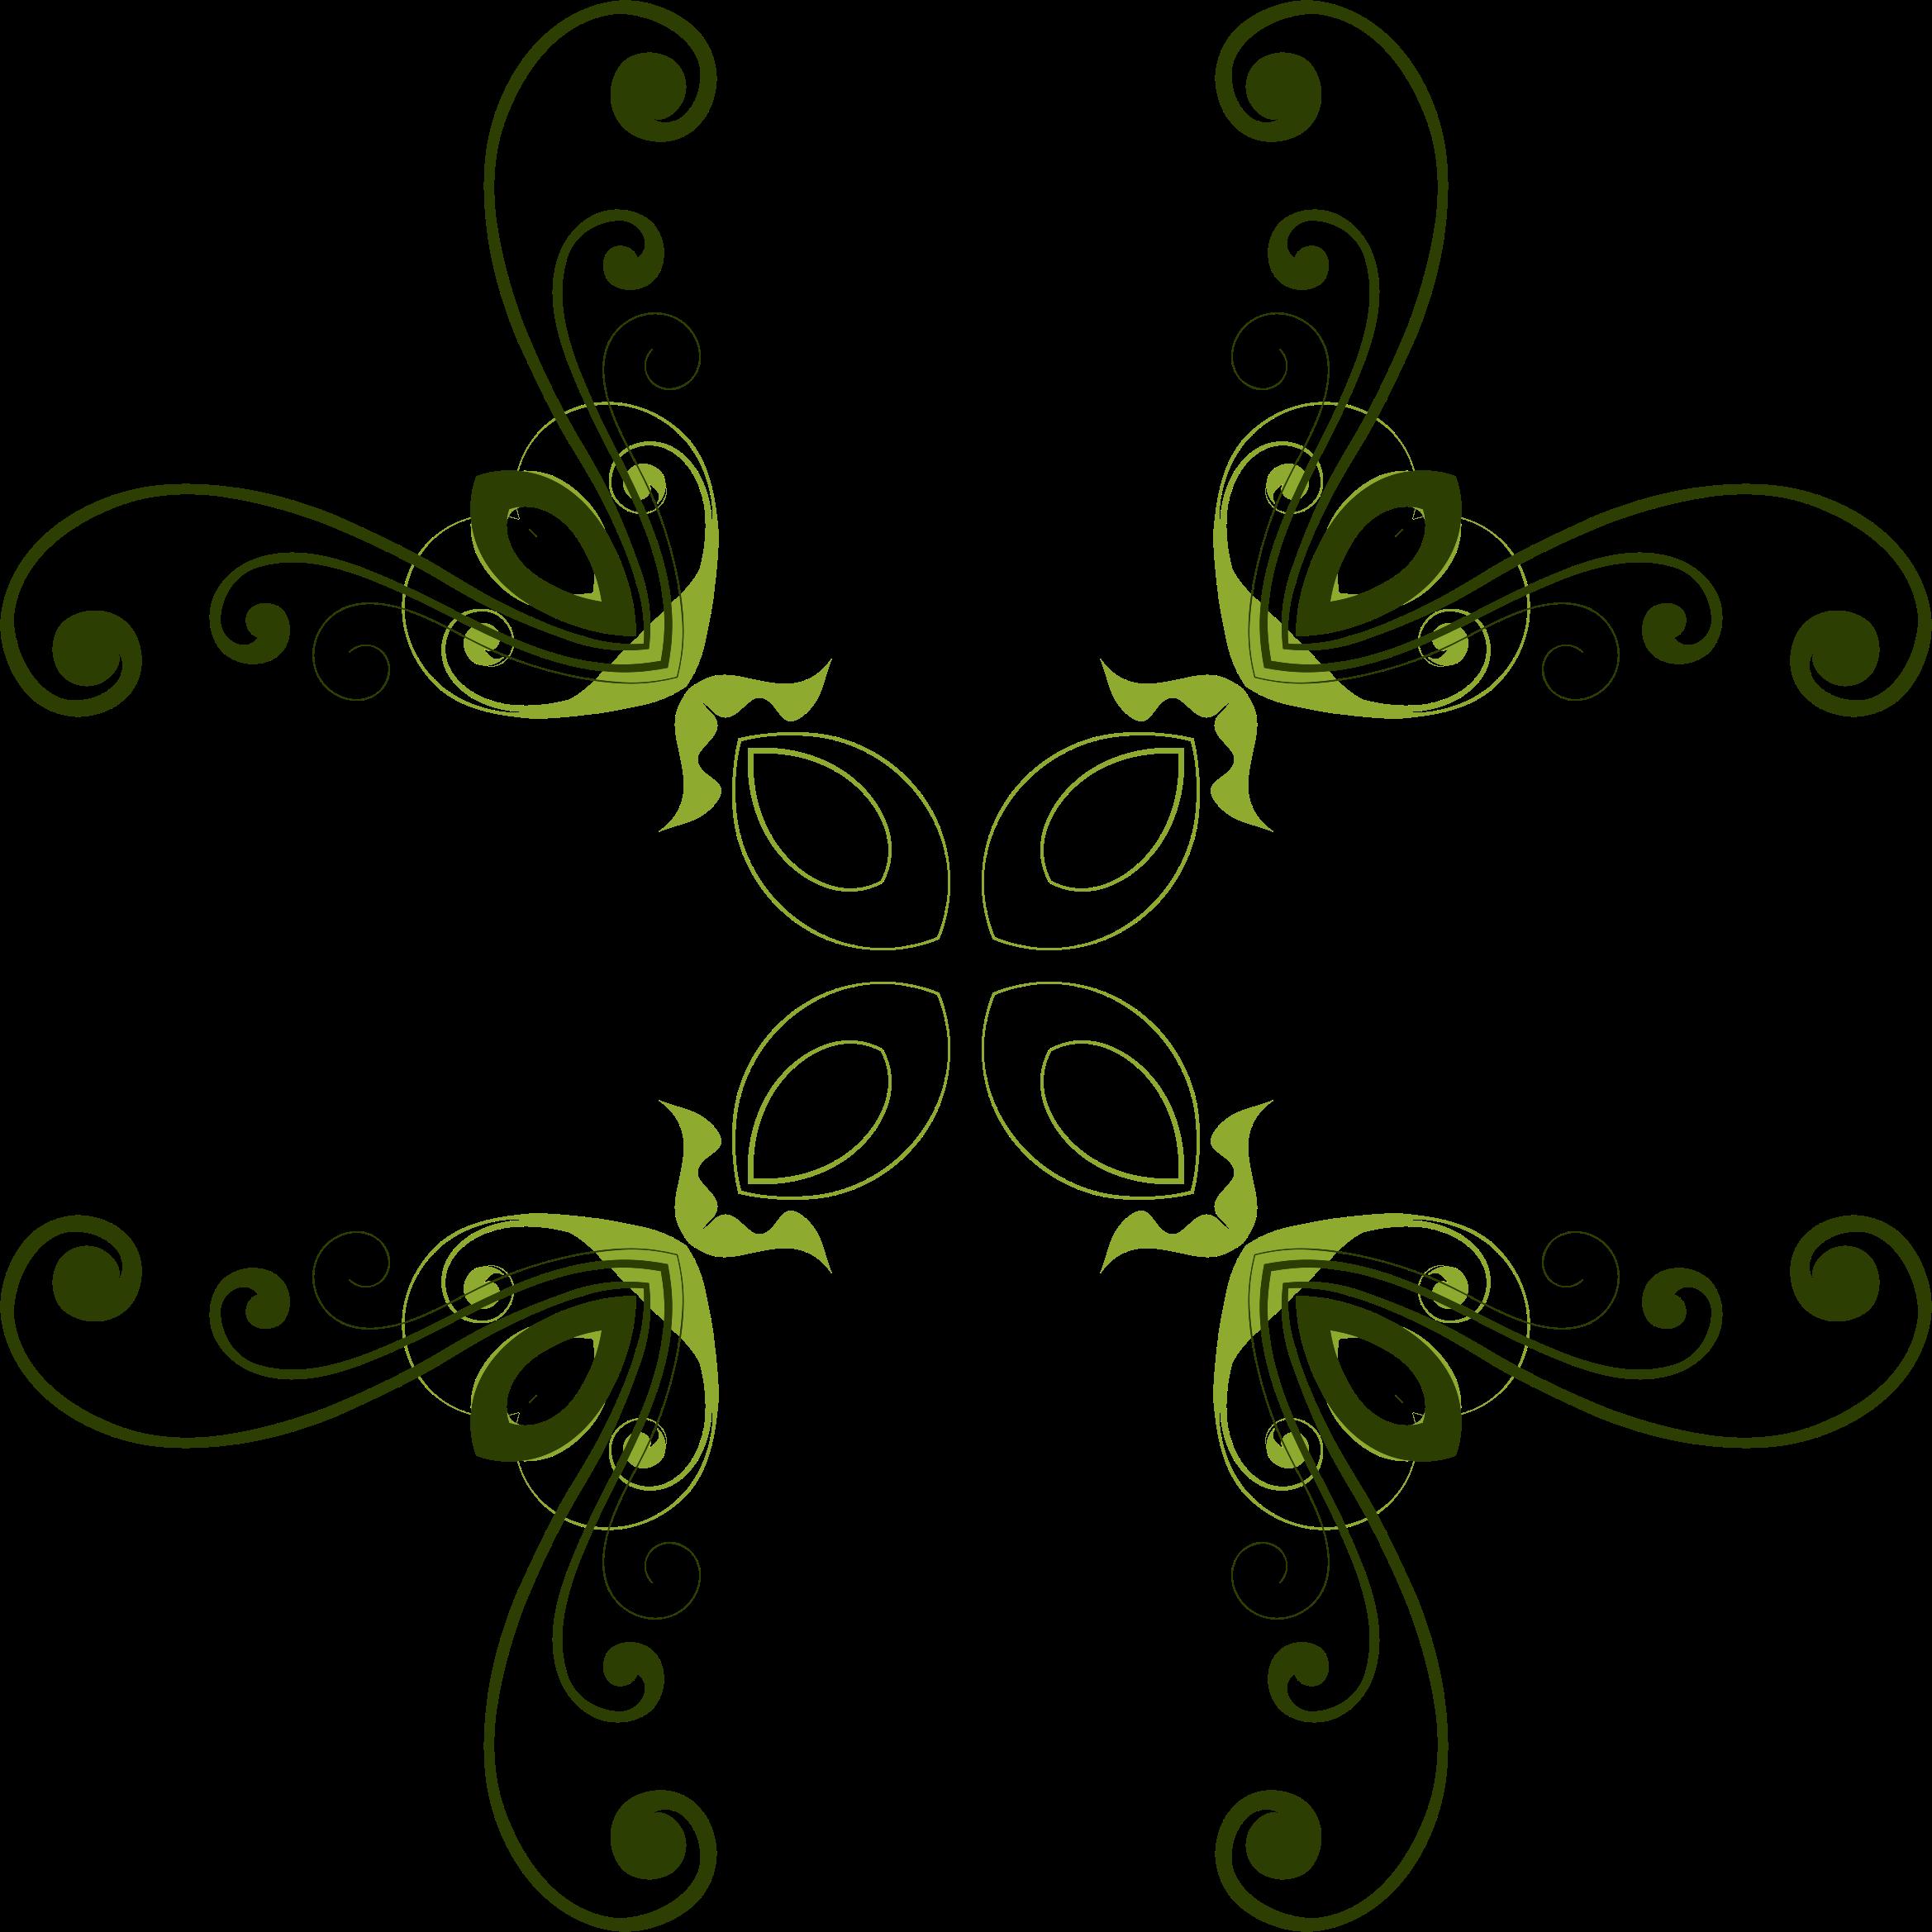 Line Art Flower Design Png : Graphics flower and floral designs vector wallpaper